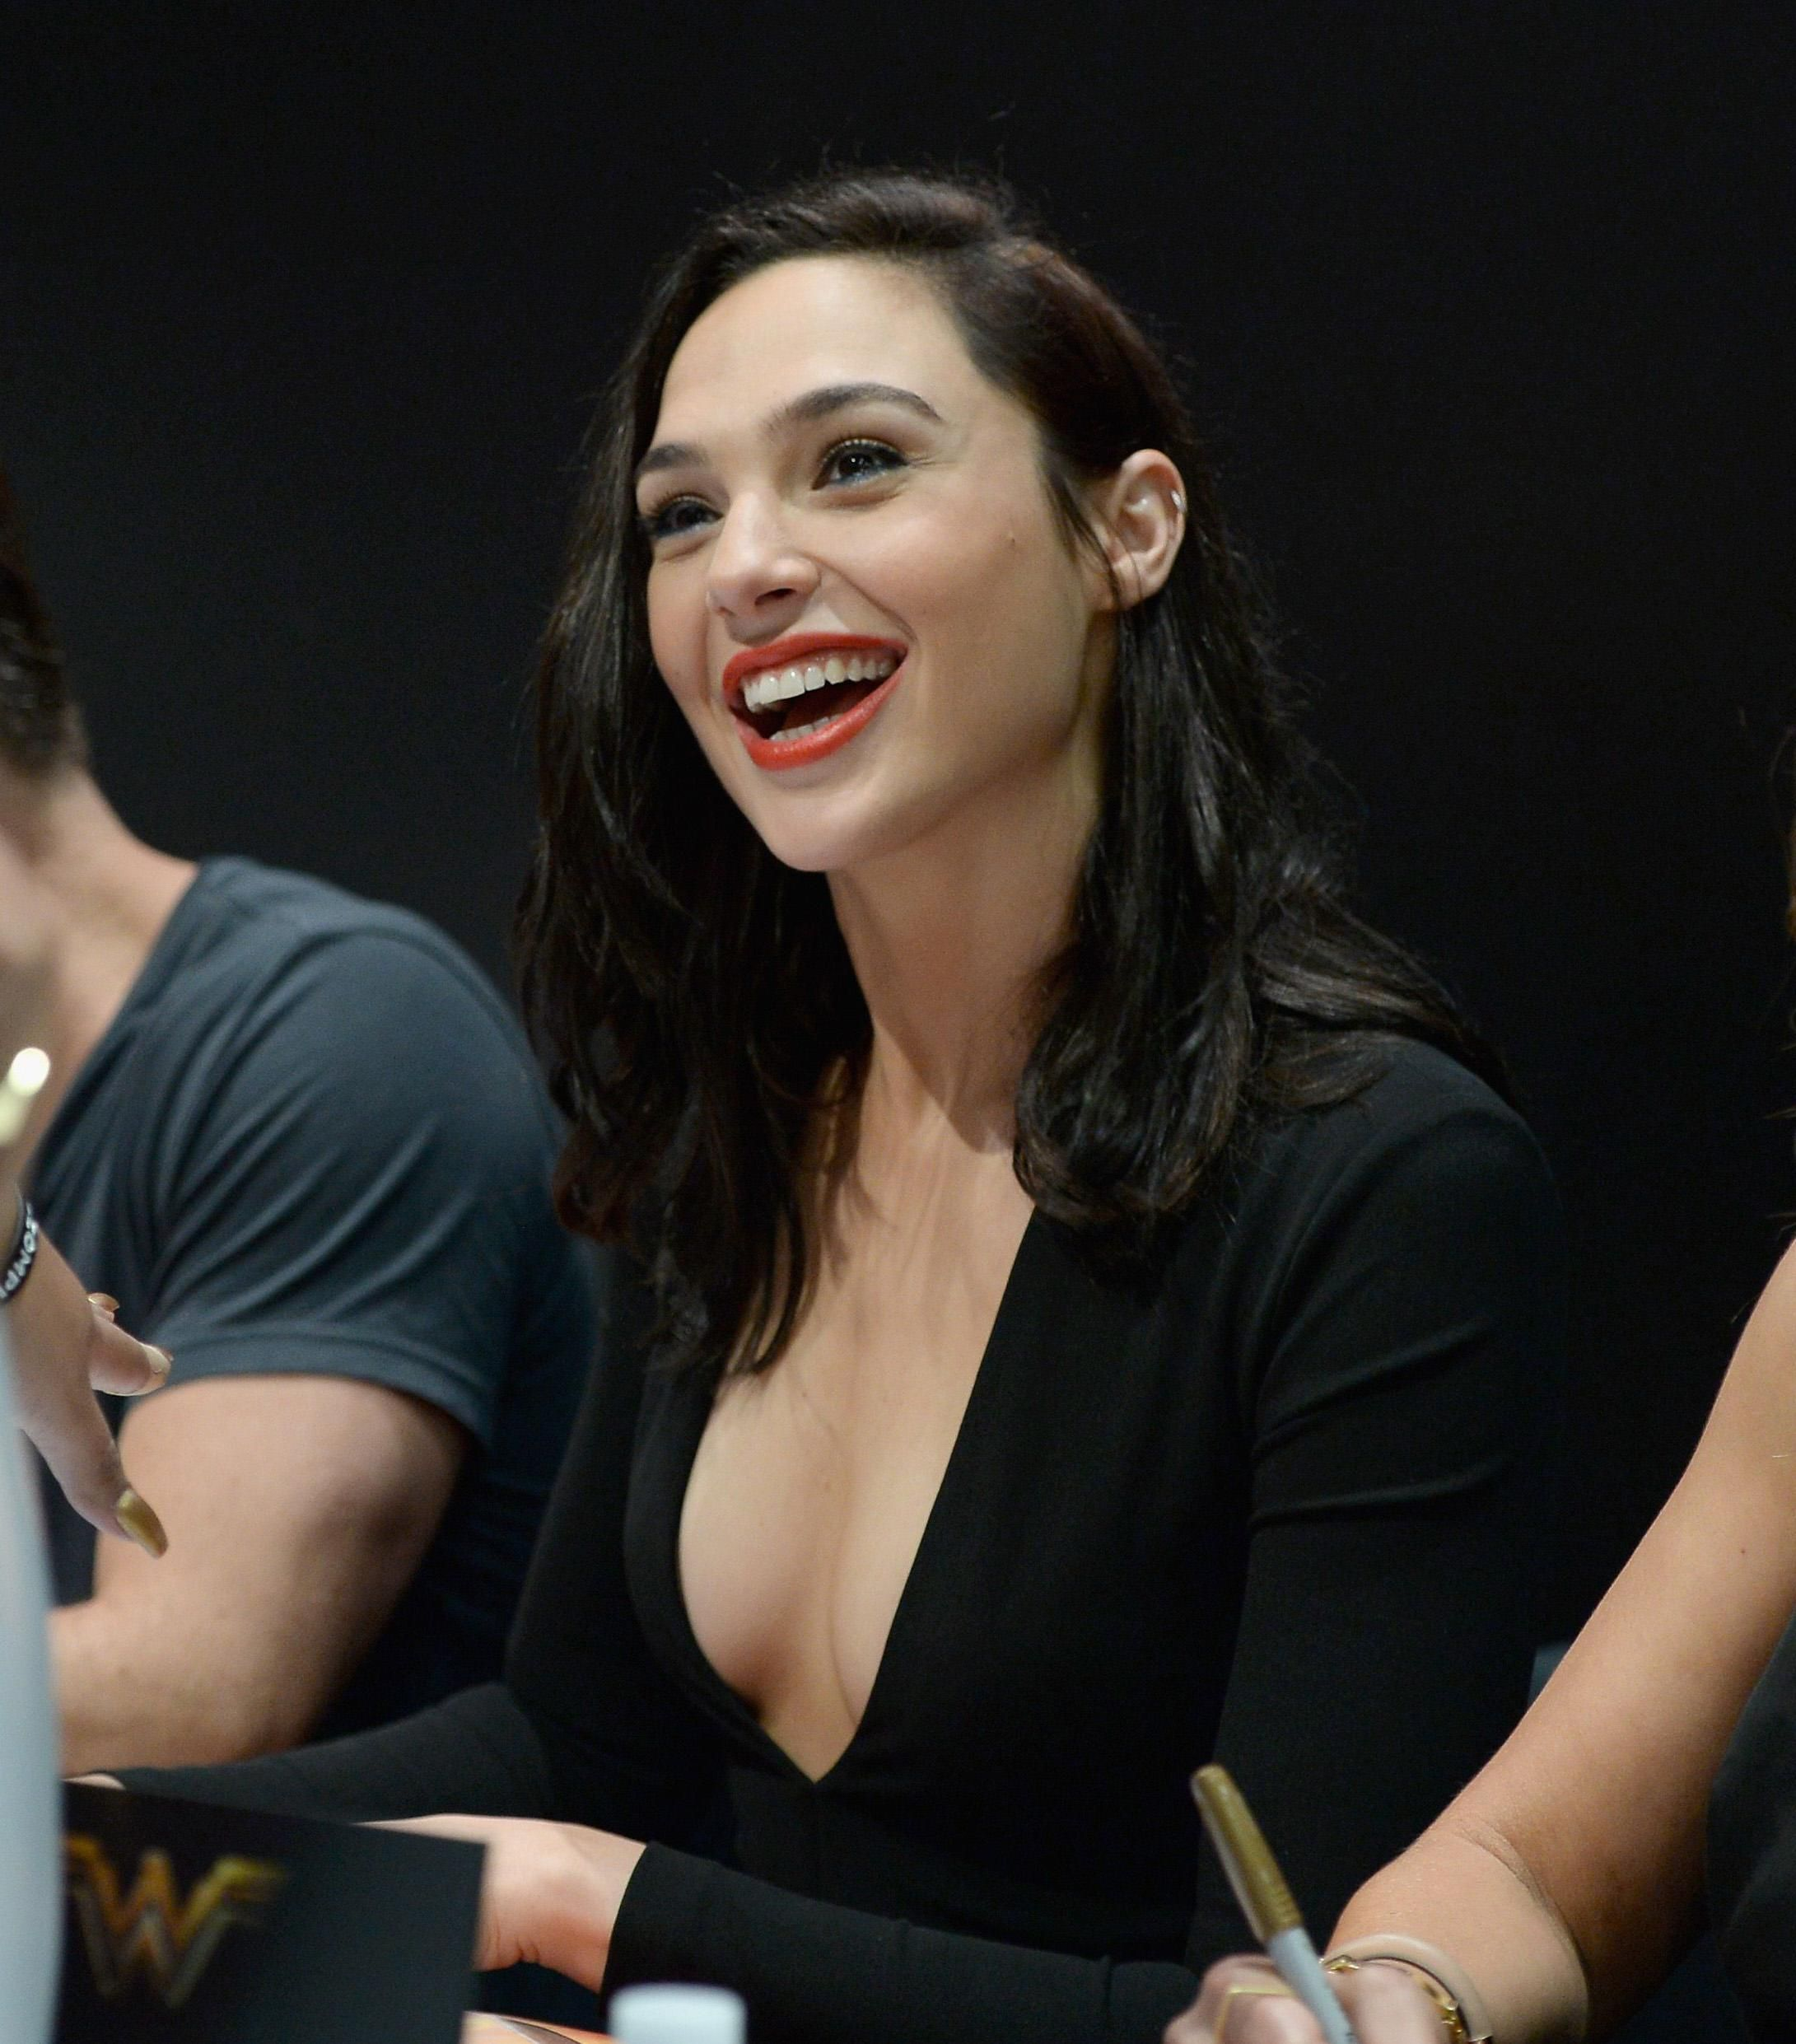 Celebrity Fakes > Images newest > Wonder-Woman | CFake.com